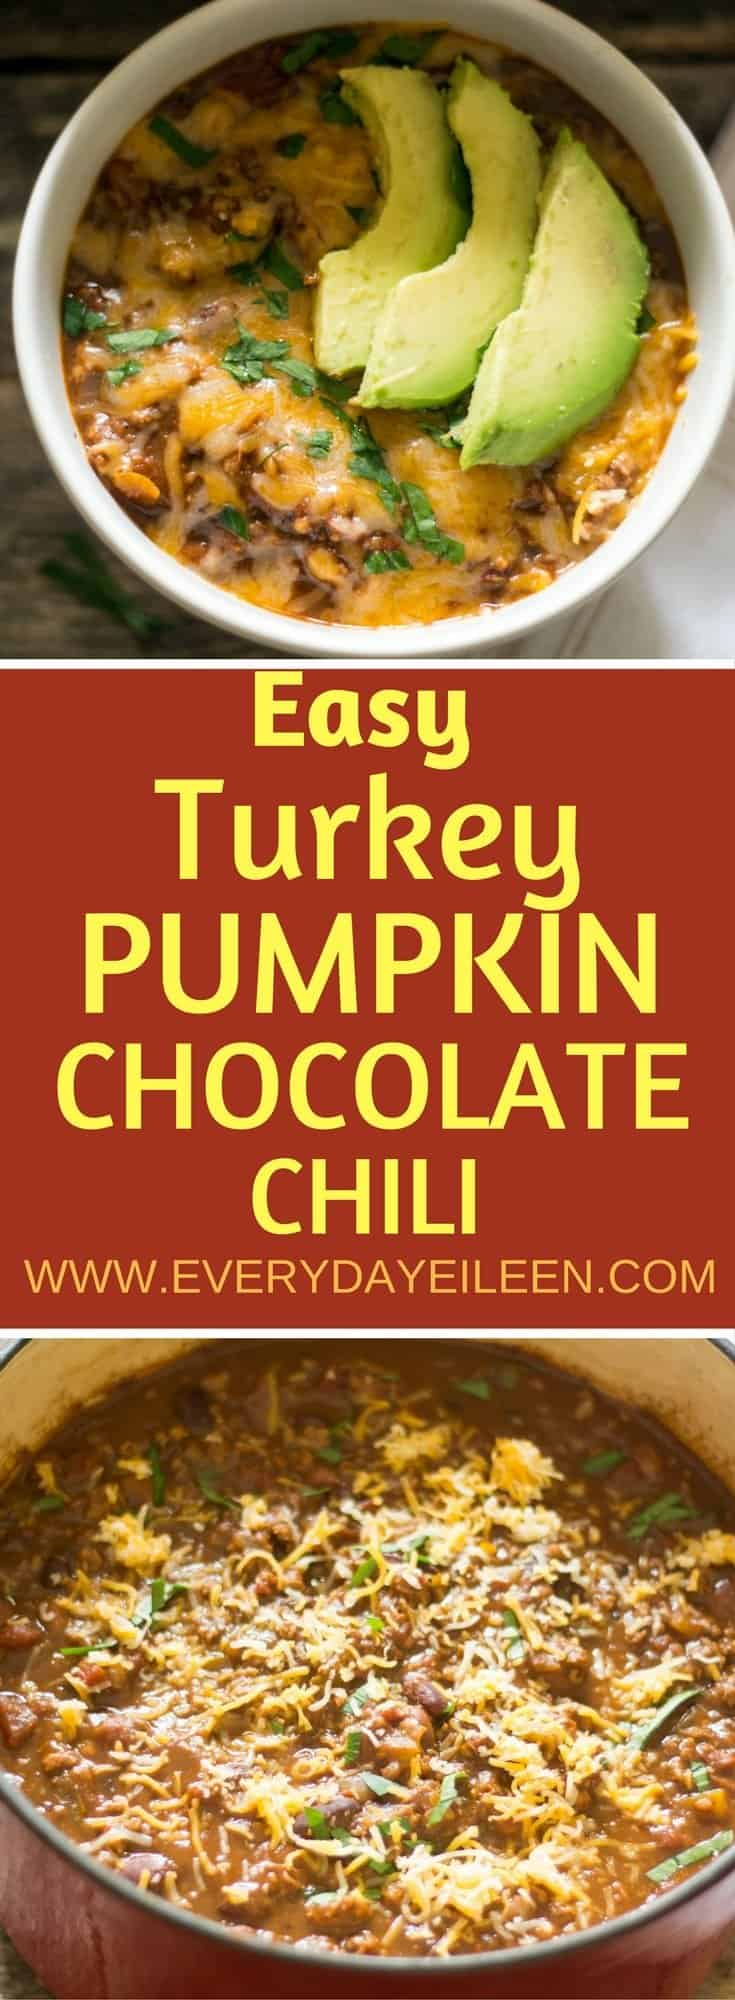 Easy TURKEY PUMPKIN CHOCOLATE CHILI